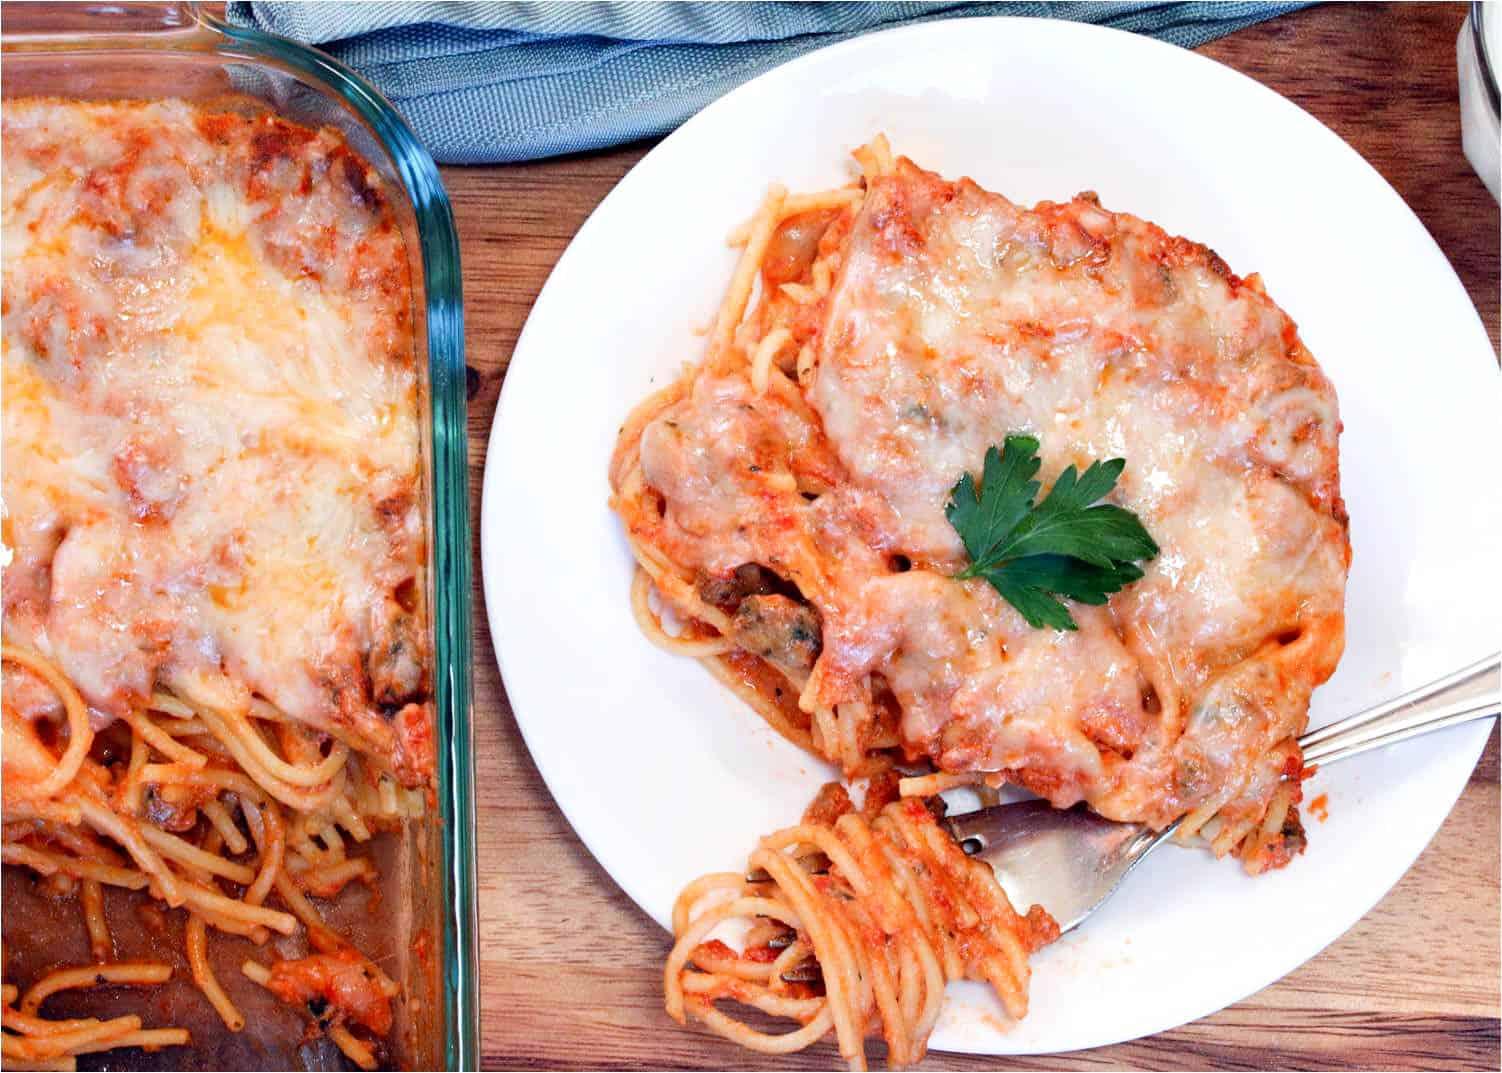 Baked-Spaghetti-